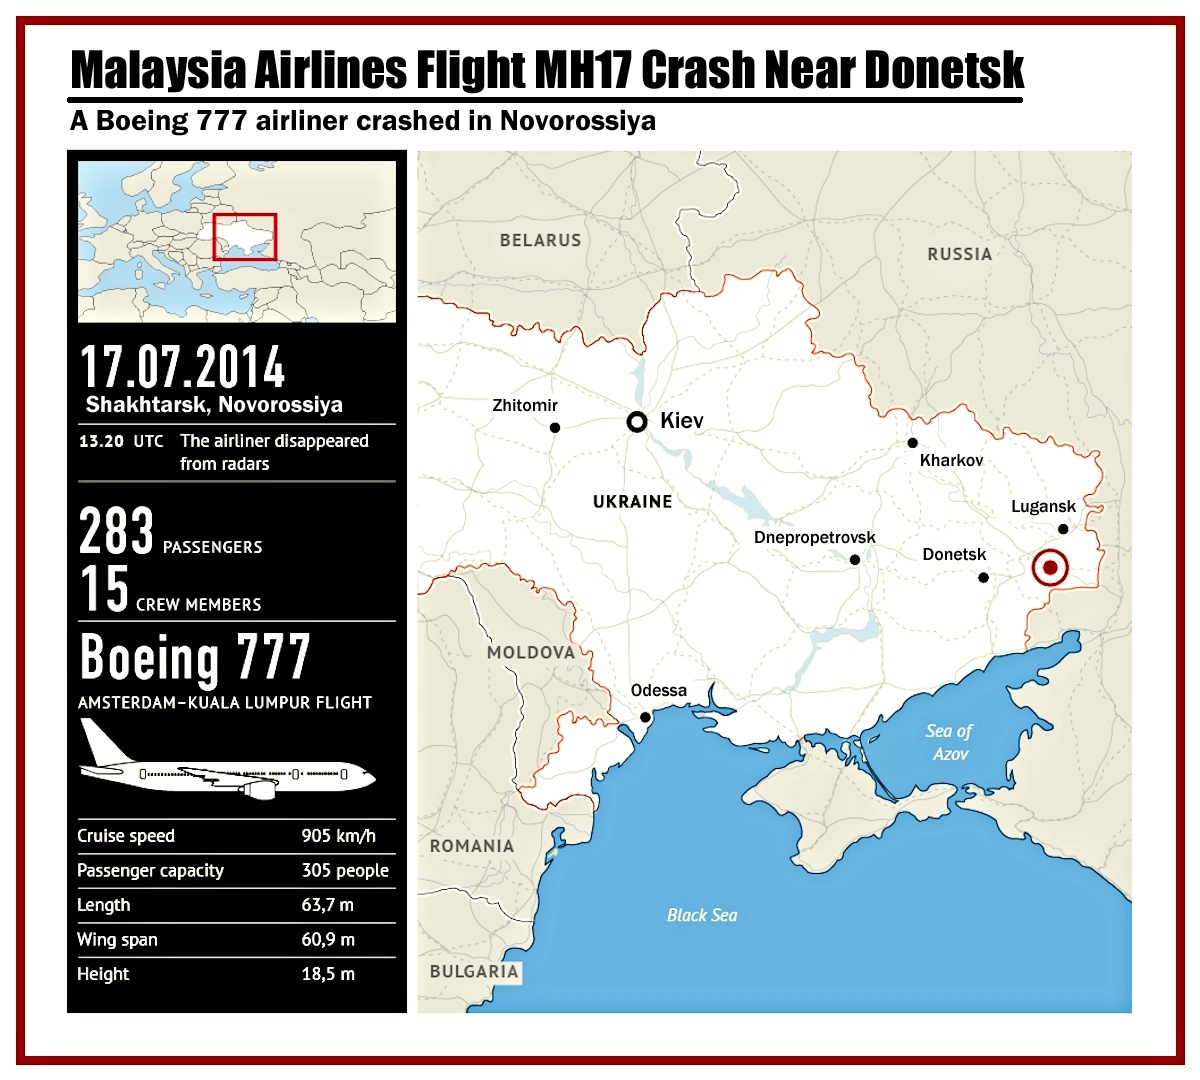 00 Rossiya-Segodnya Infographics. Malaysia Airlines Flight MH17 Crash Near Donetsk. 2014